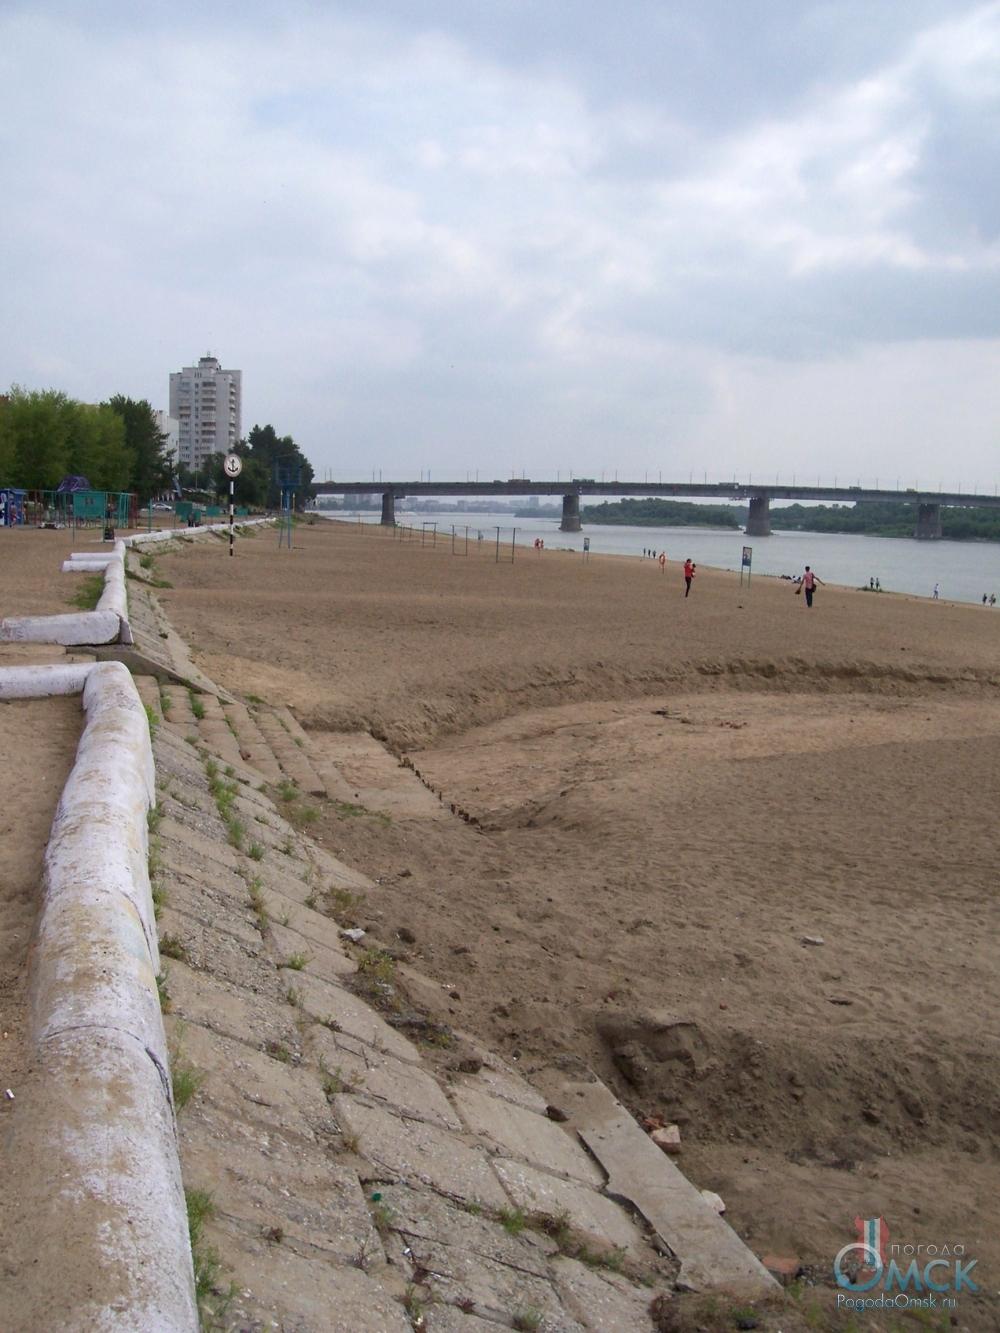 Пляж Центральный-2